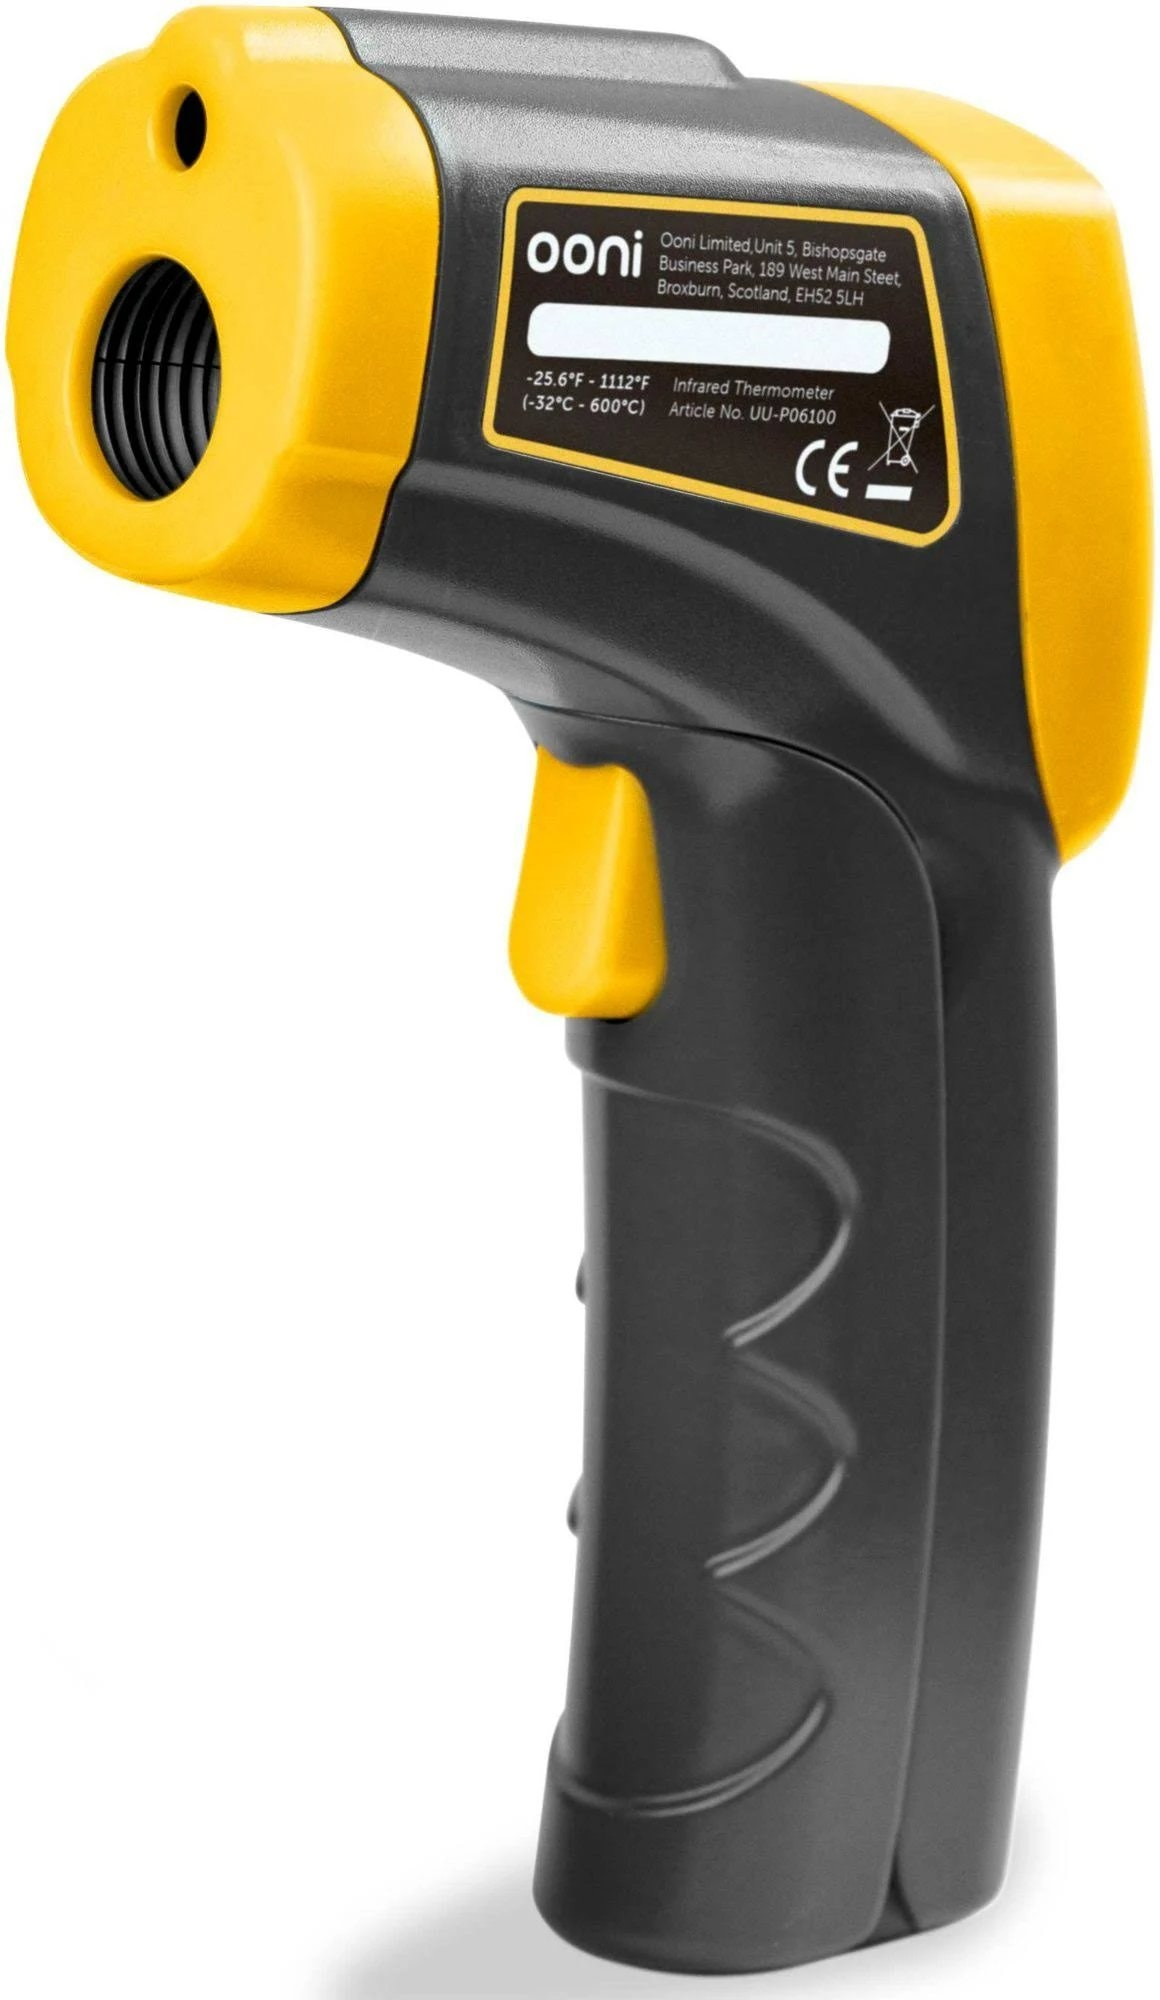 Ooni Digital Thermometer